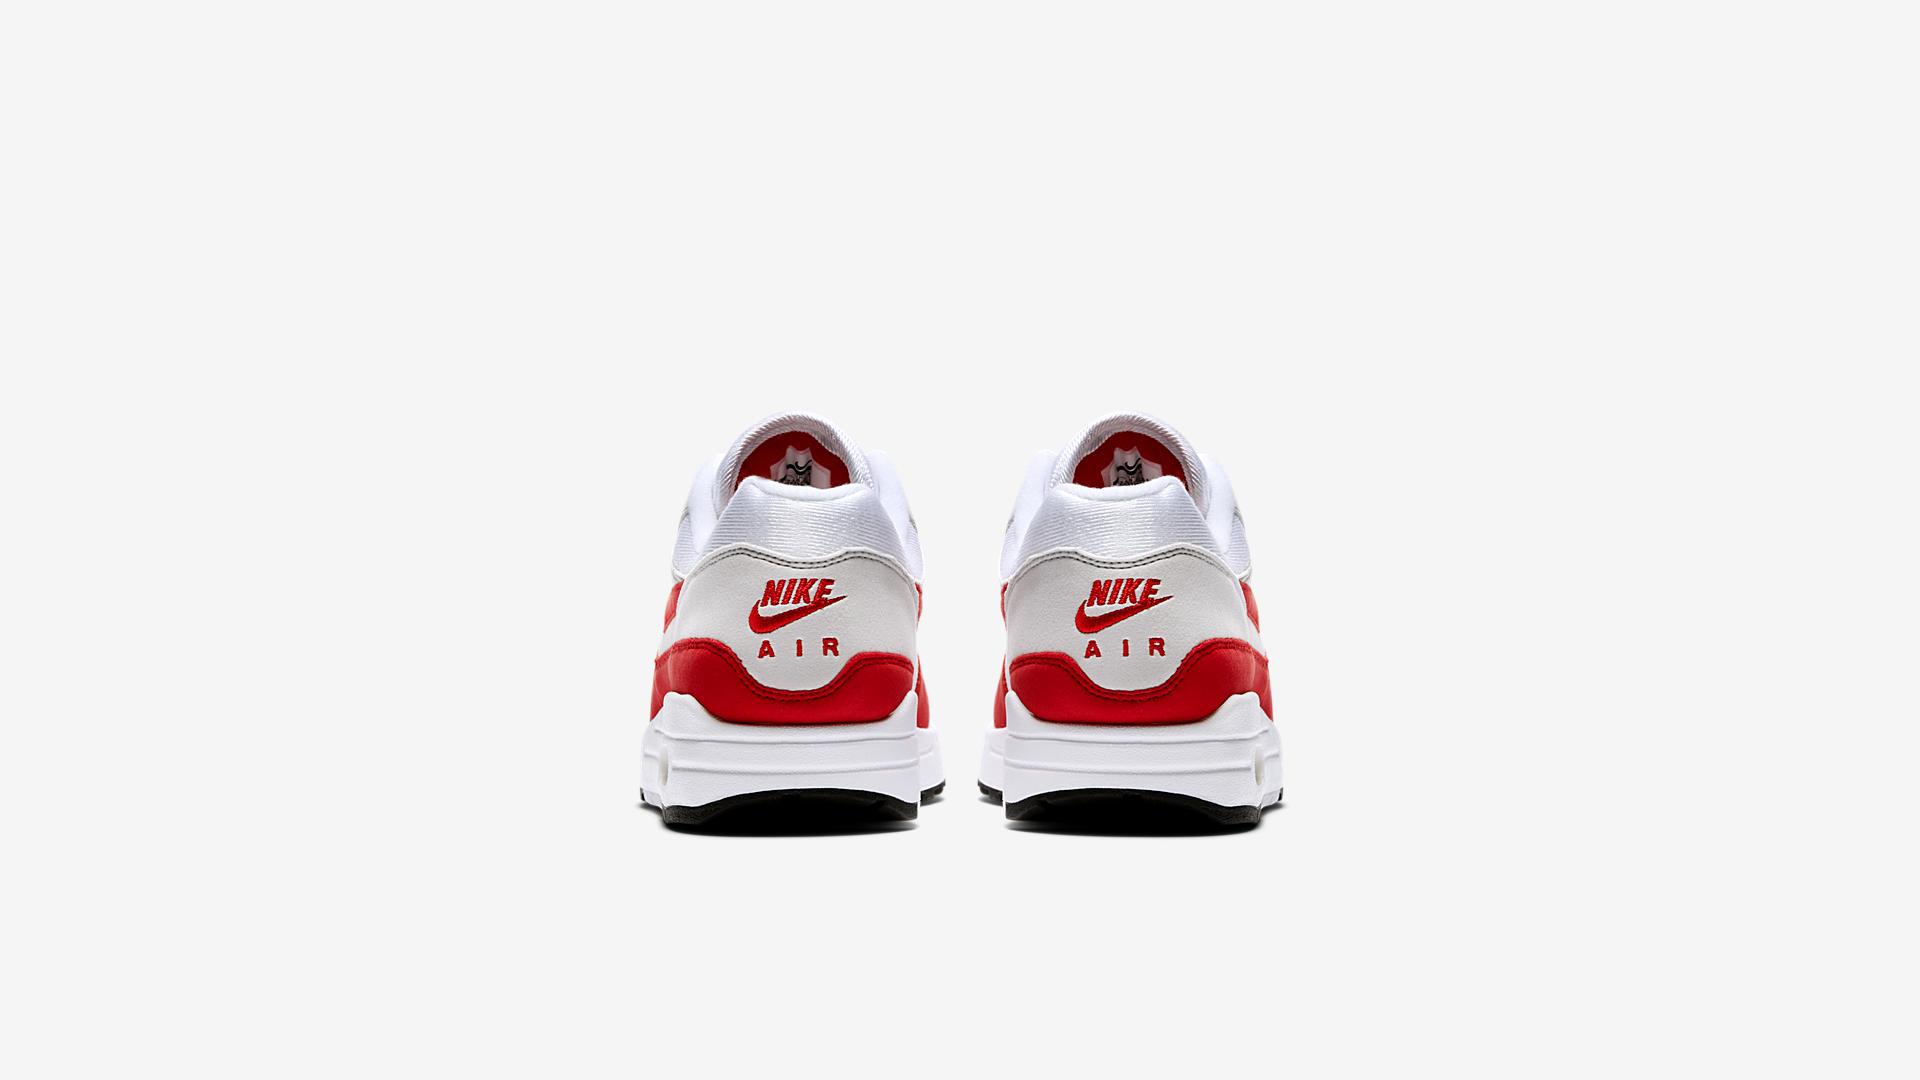 908375 103 Nike Air Max 1 Anniversary University Red 2